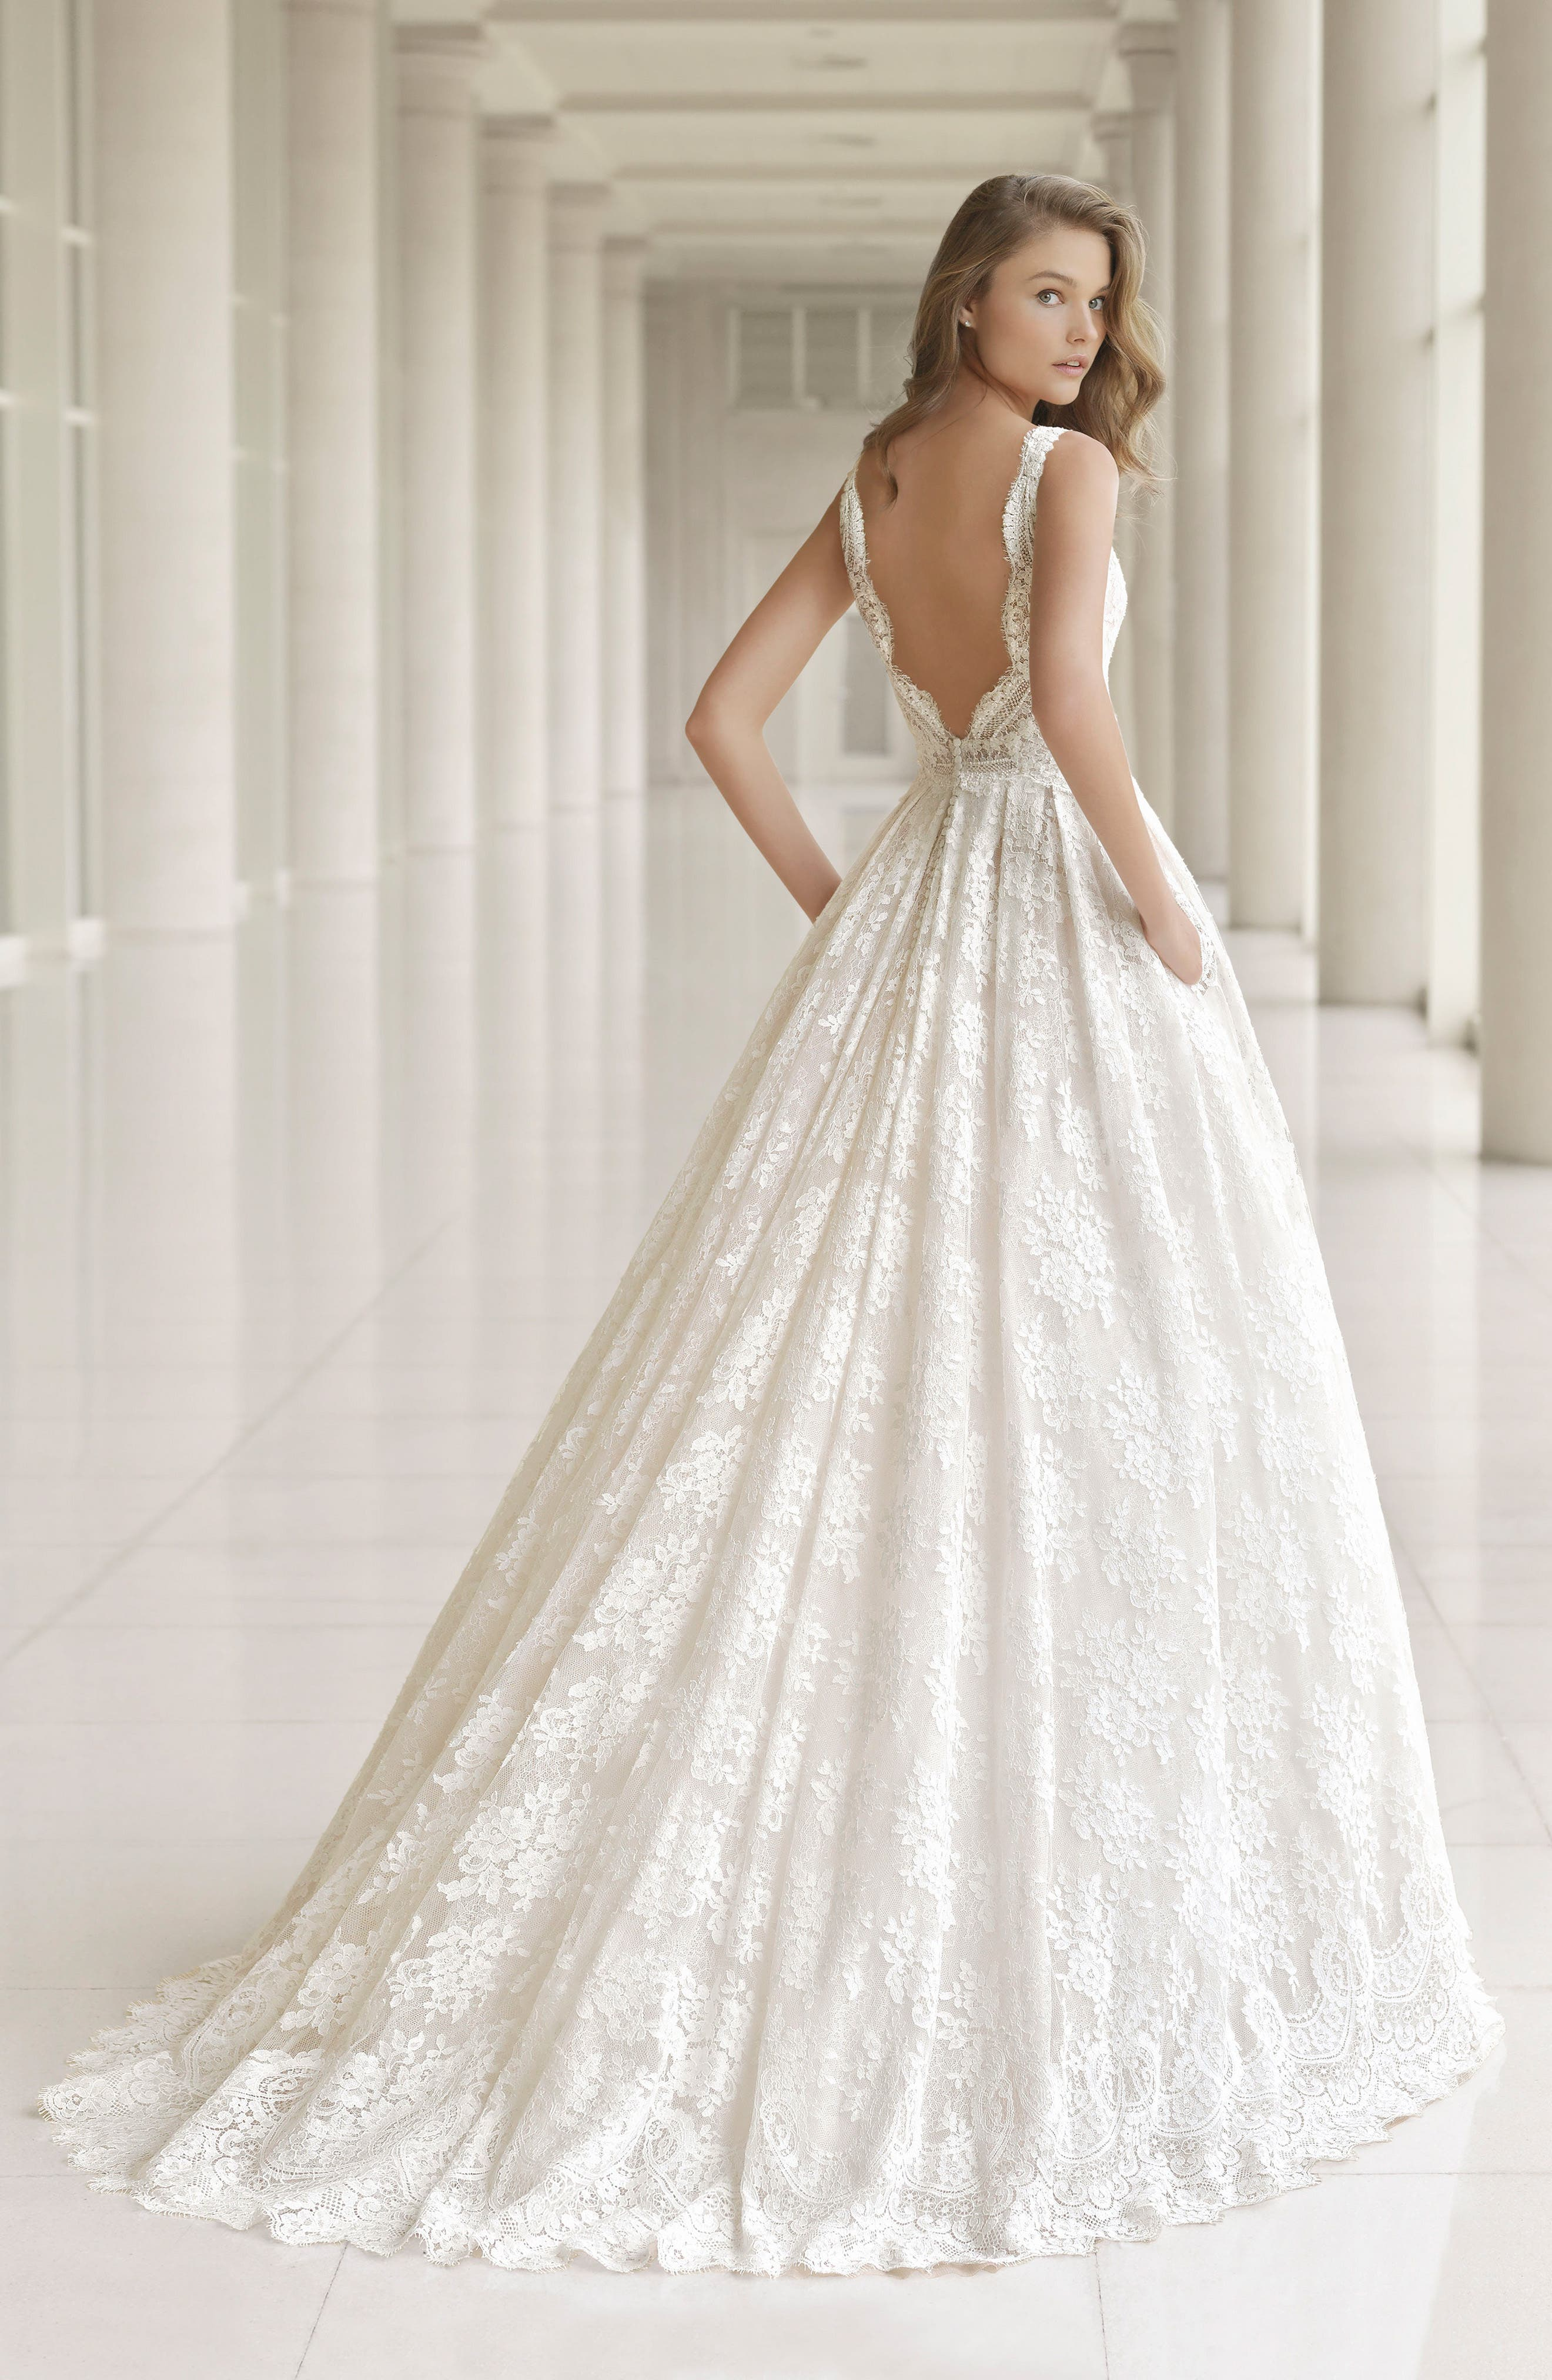 Women wearing wedding diapers - Women Wearing Wedding Diapers 45